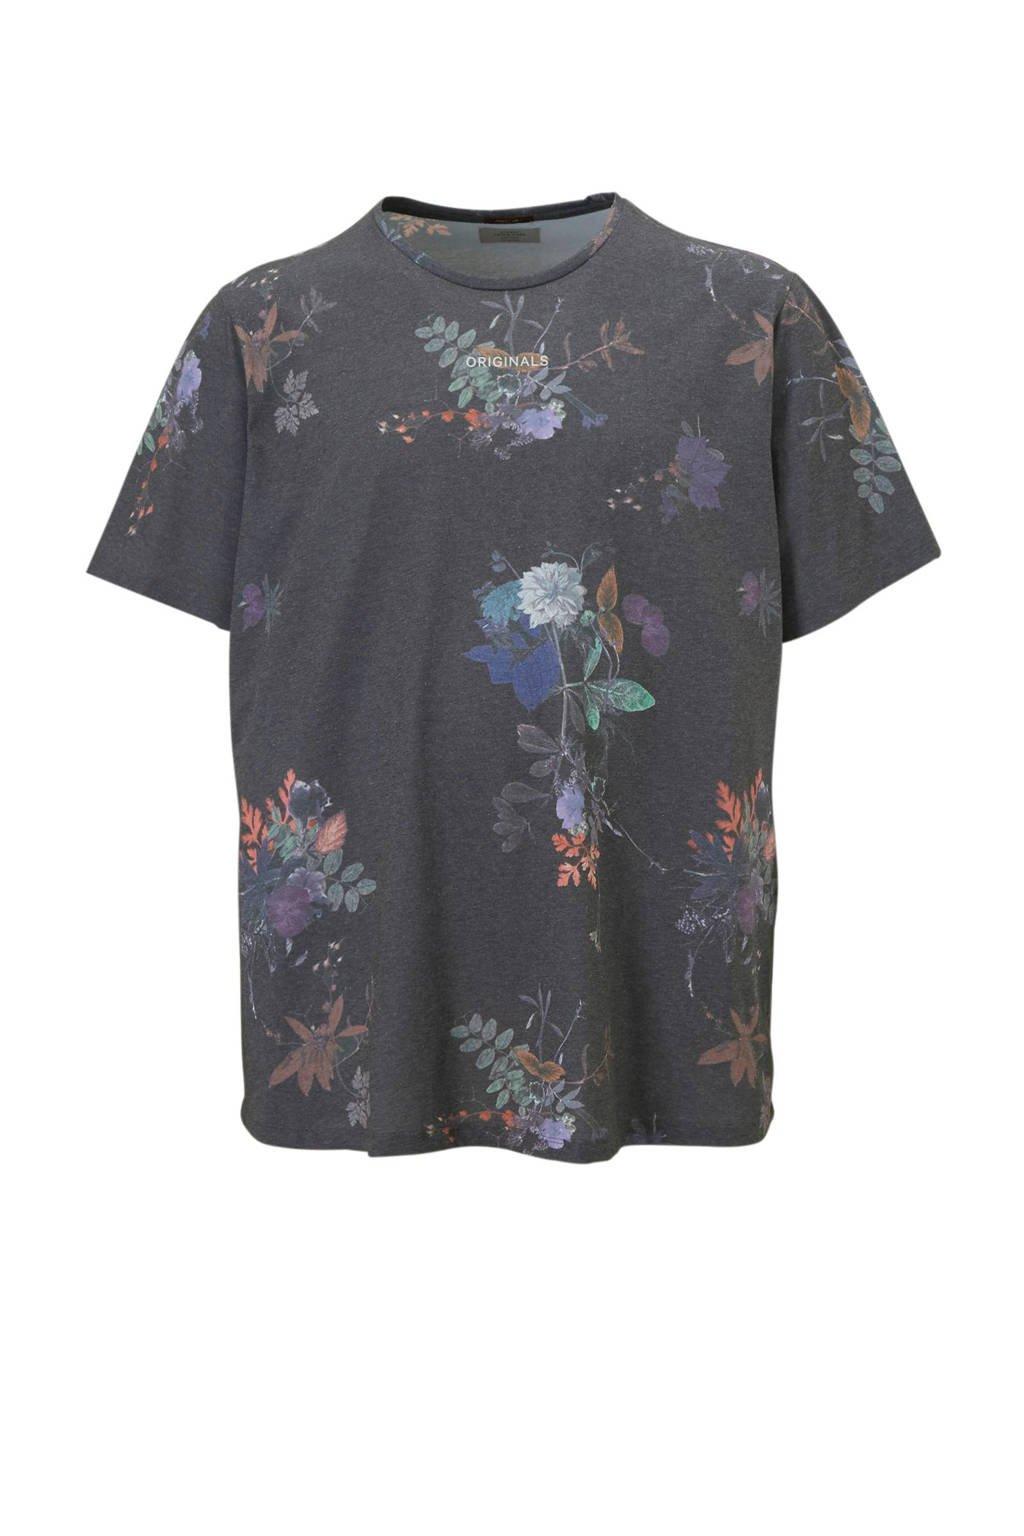 Jack & Jones Originals T-shirt, Grijs